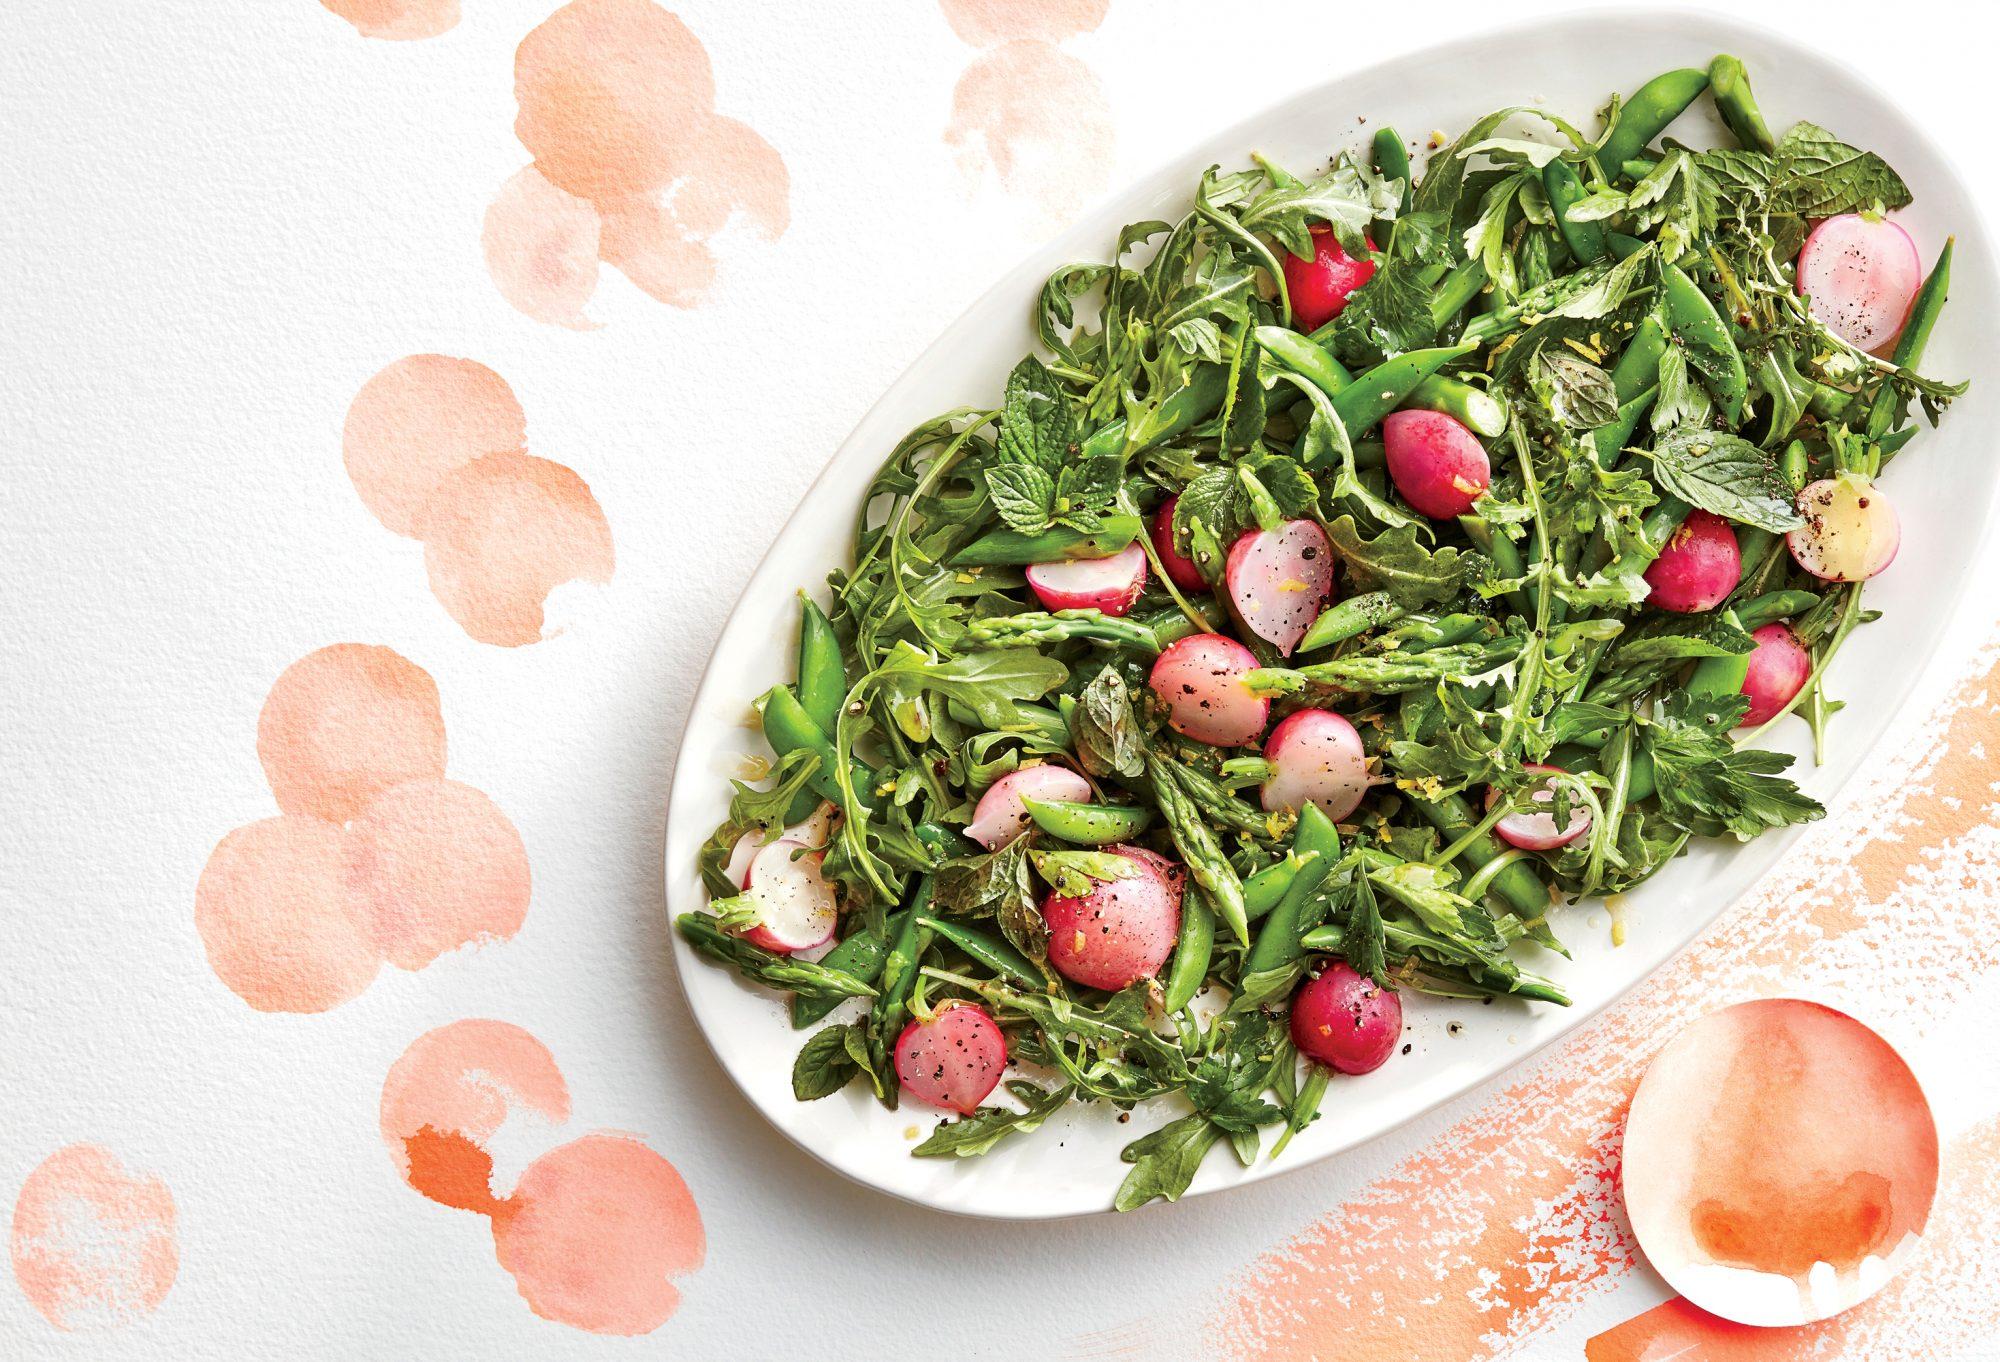 Spring Vegetable and Herb Salad